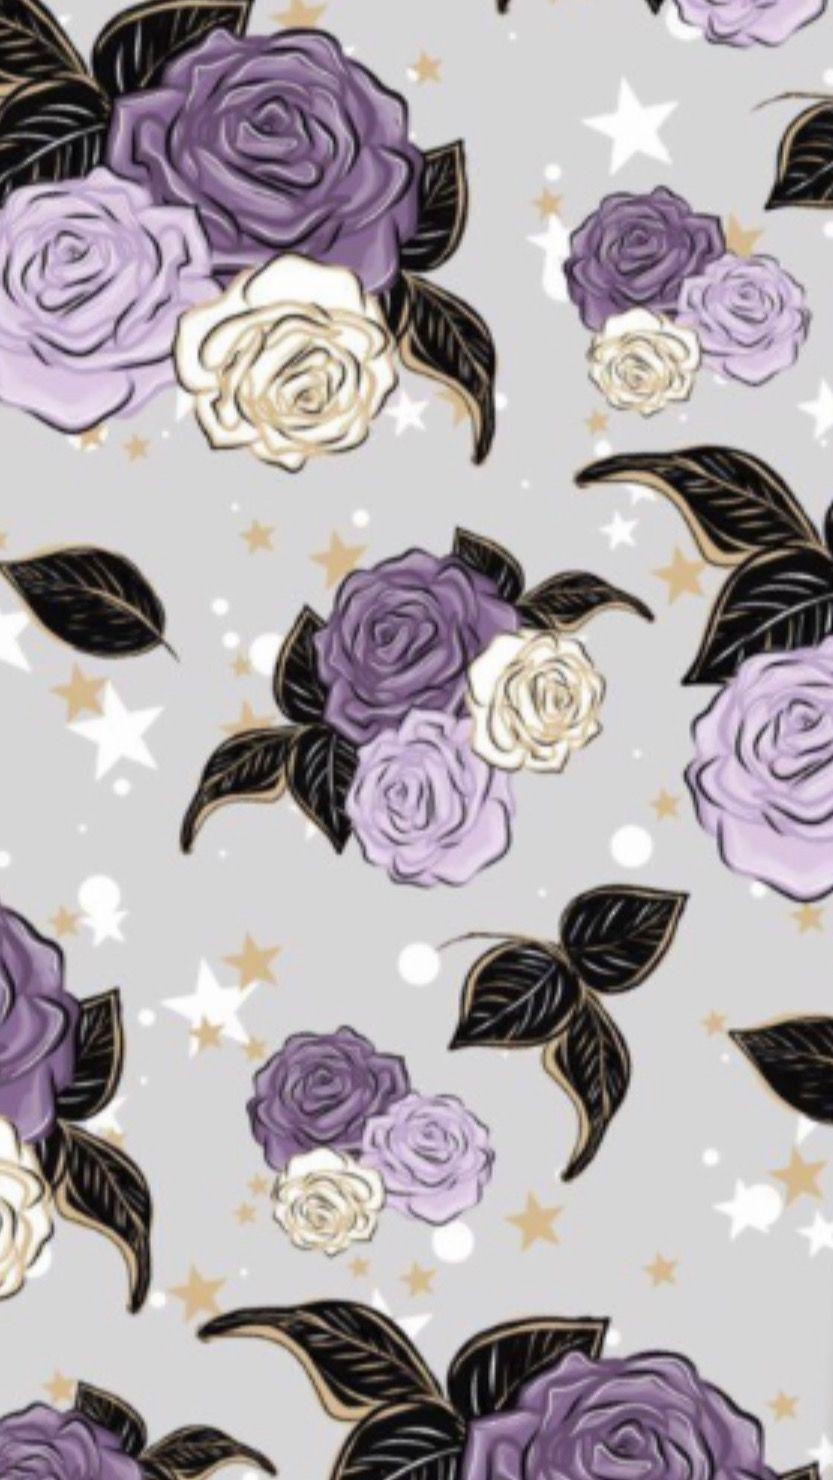 ︎∣ᴮᵞᵛᴵ·⁴·ᵞᴼᵁ∣ ︎ Rose wallpaper, Pretty phone wallpaper